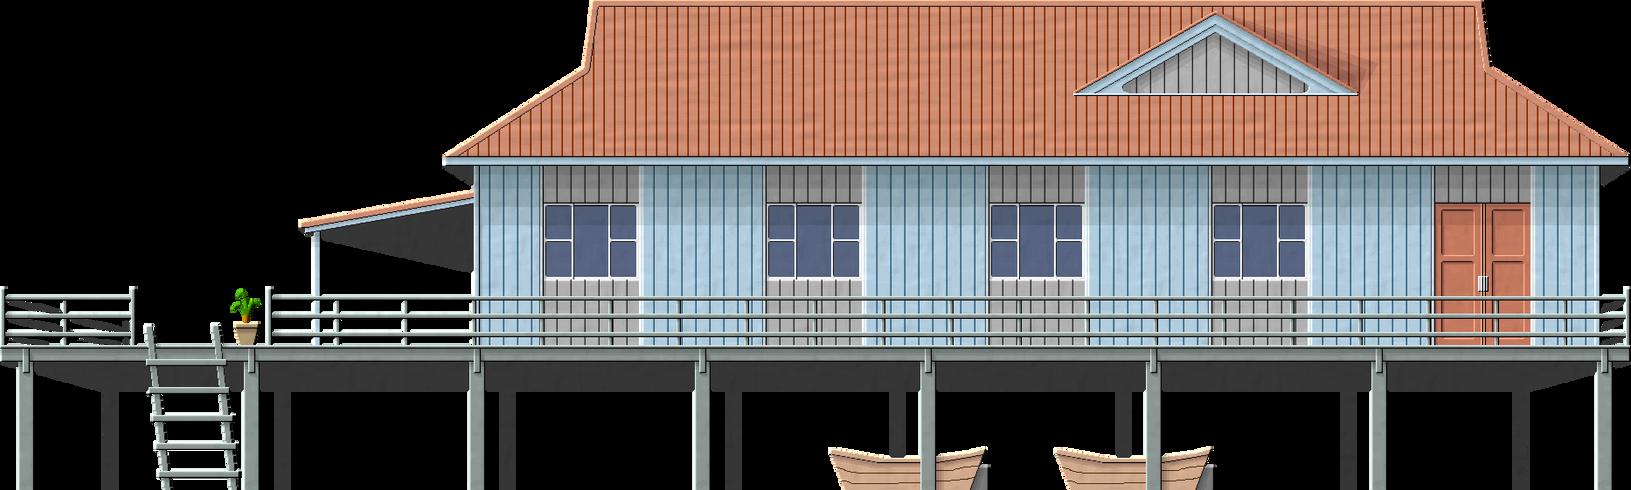 Kampong Ayer Building by Herbertrocha